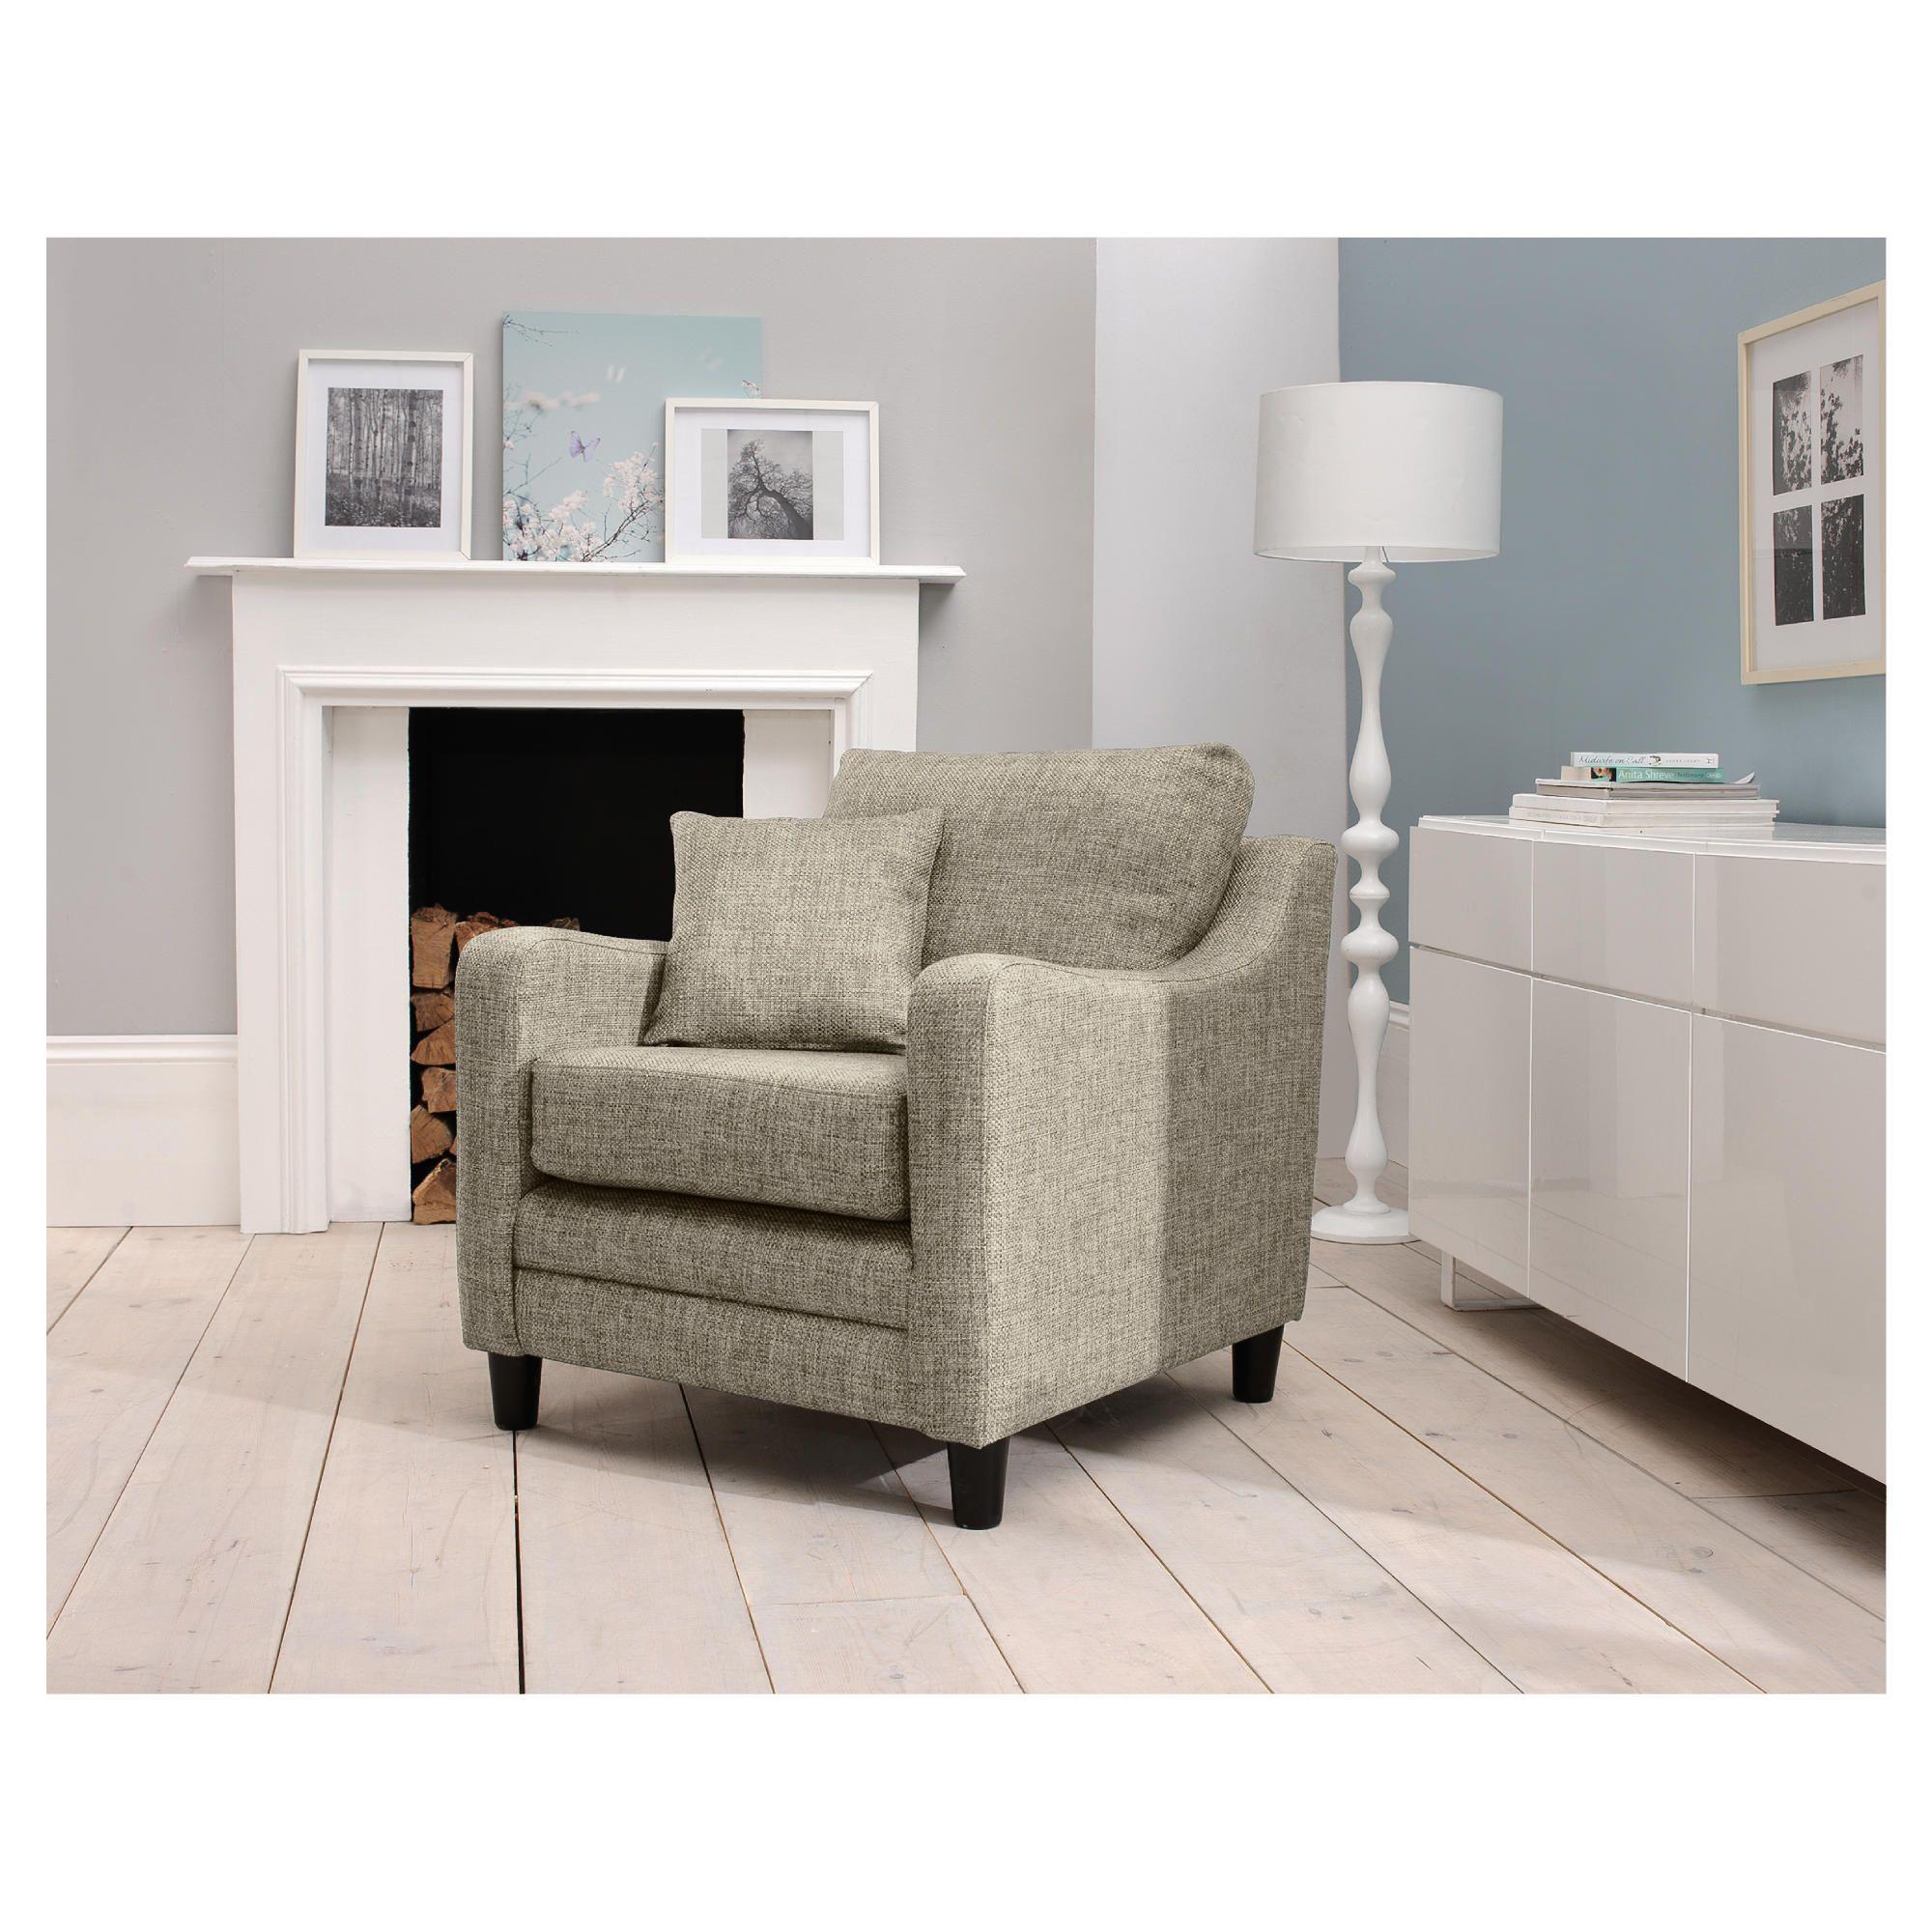 Buckingham Fabric Armchair Sofa Biscuit at Tesco Direct